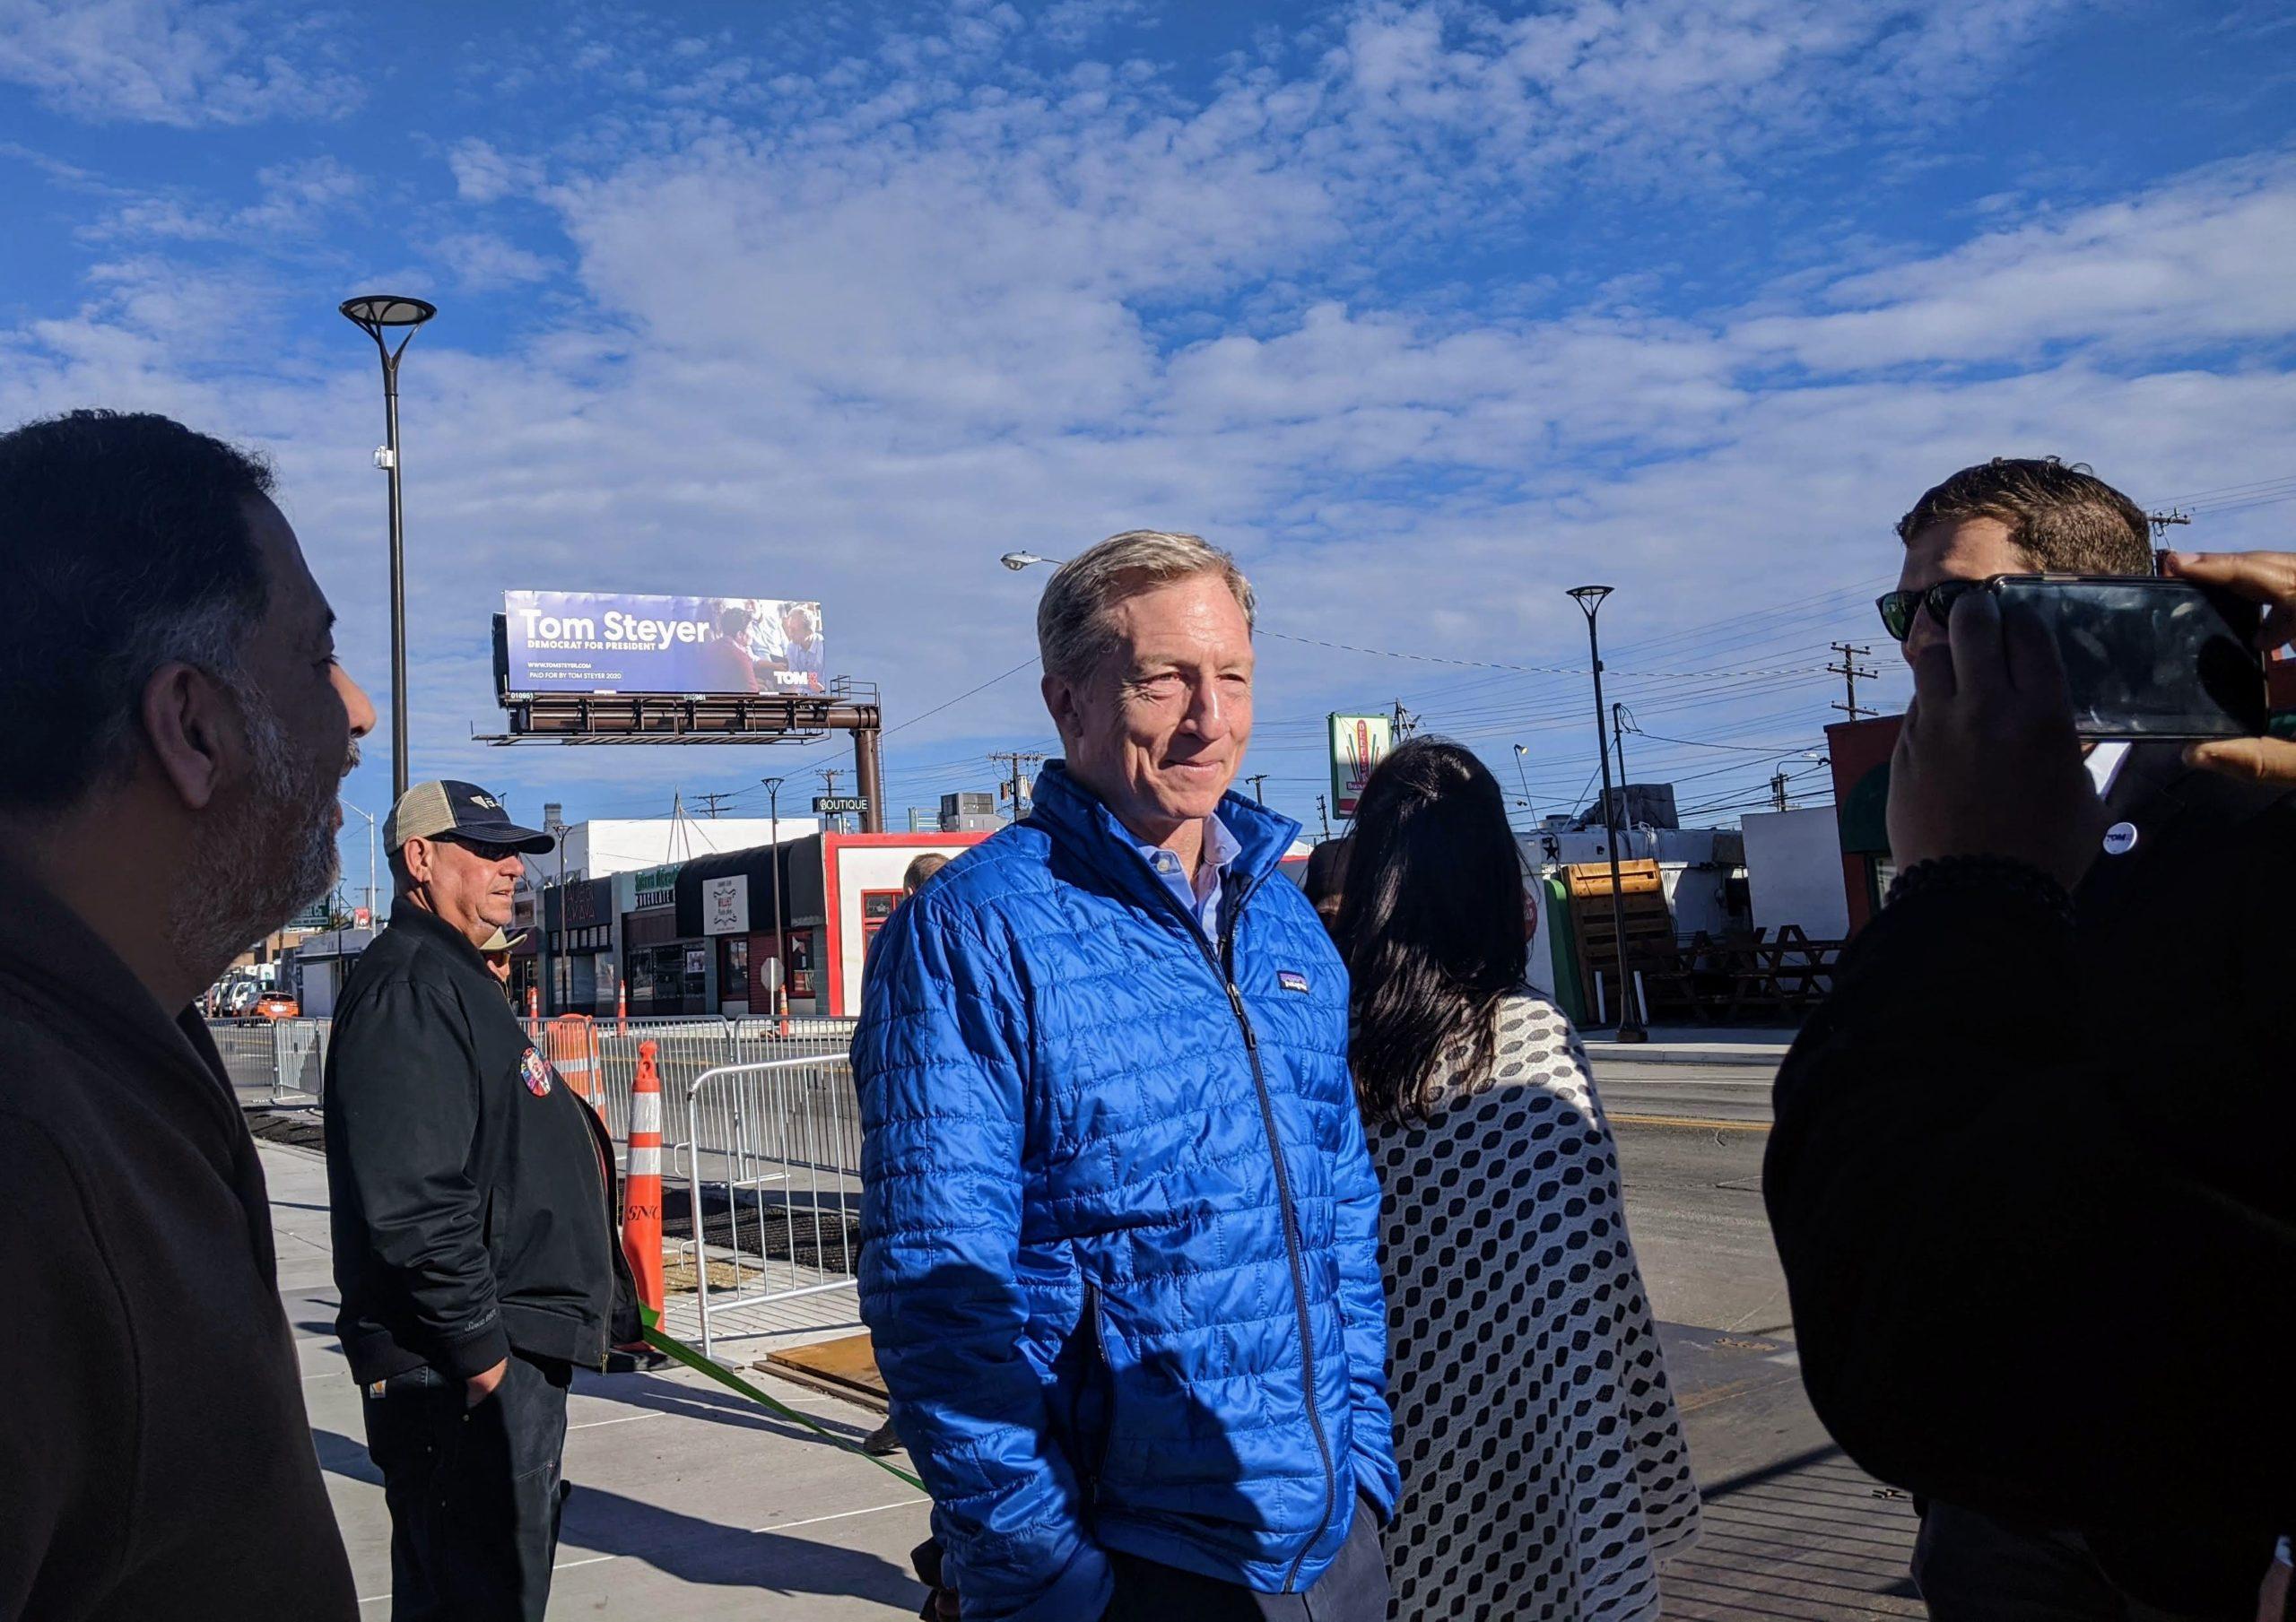 Tom Steyer visits Reno 2020